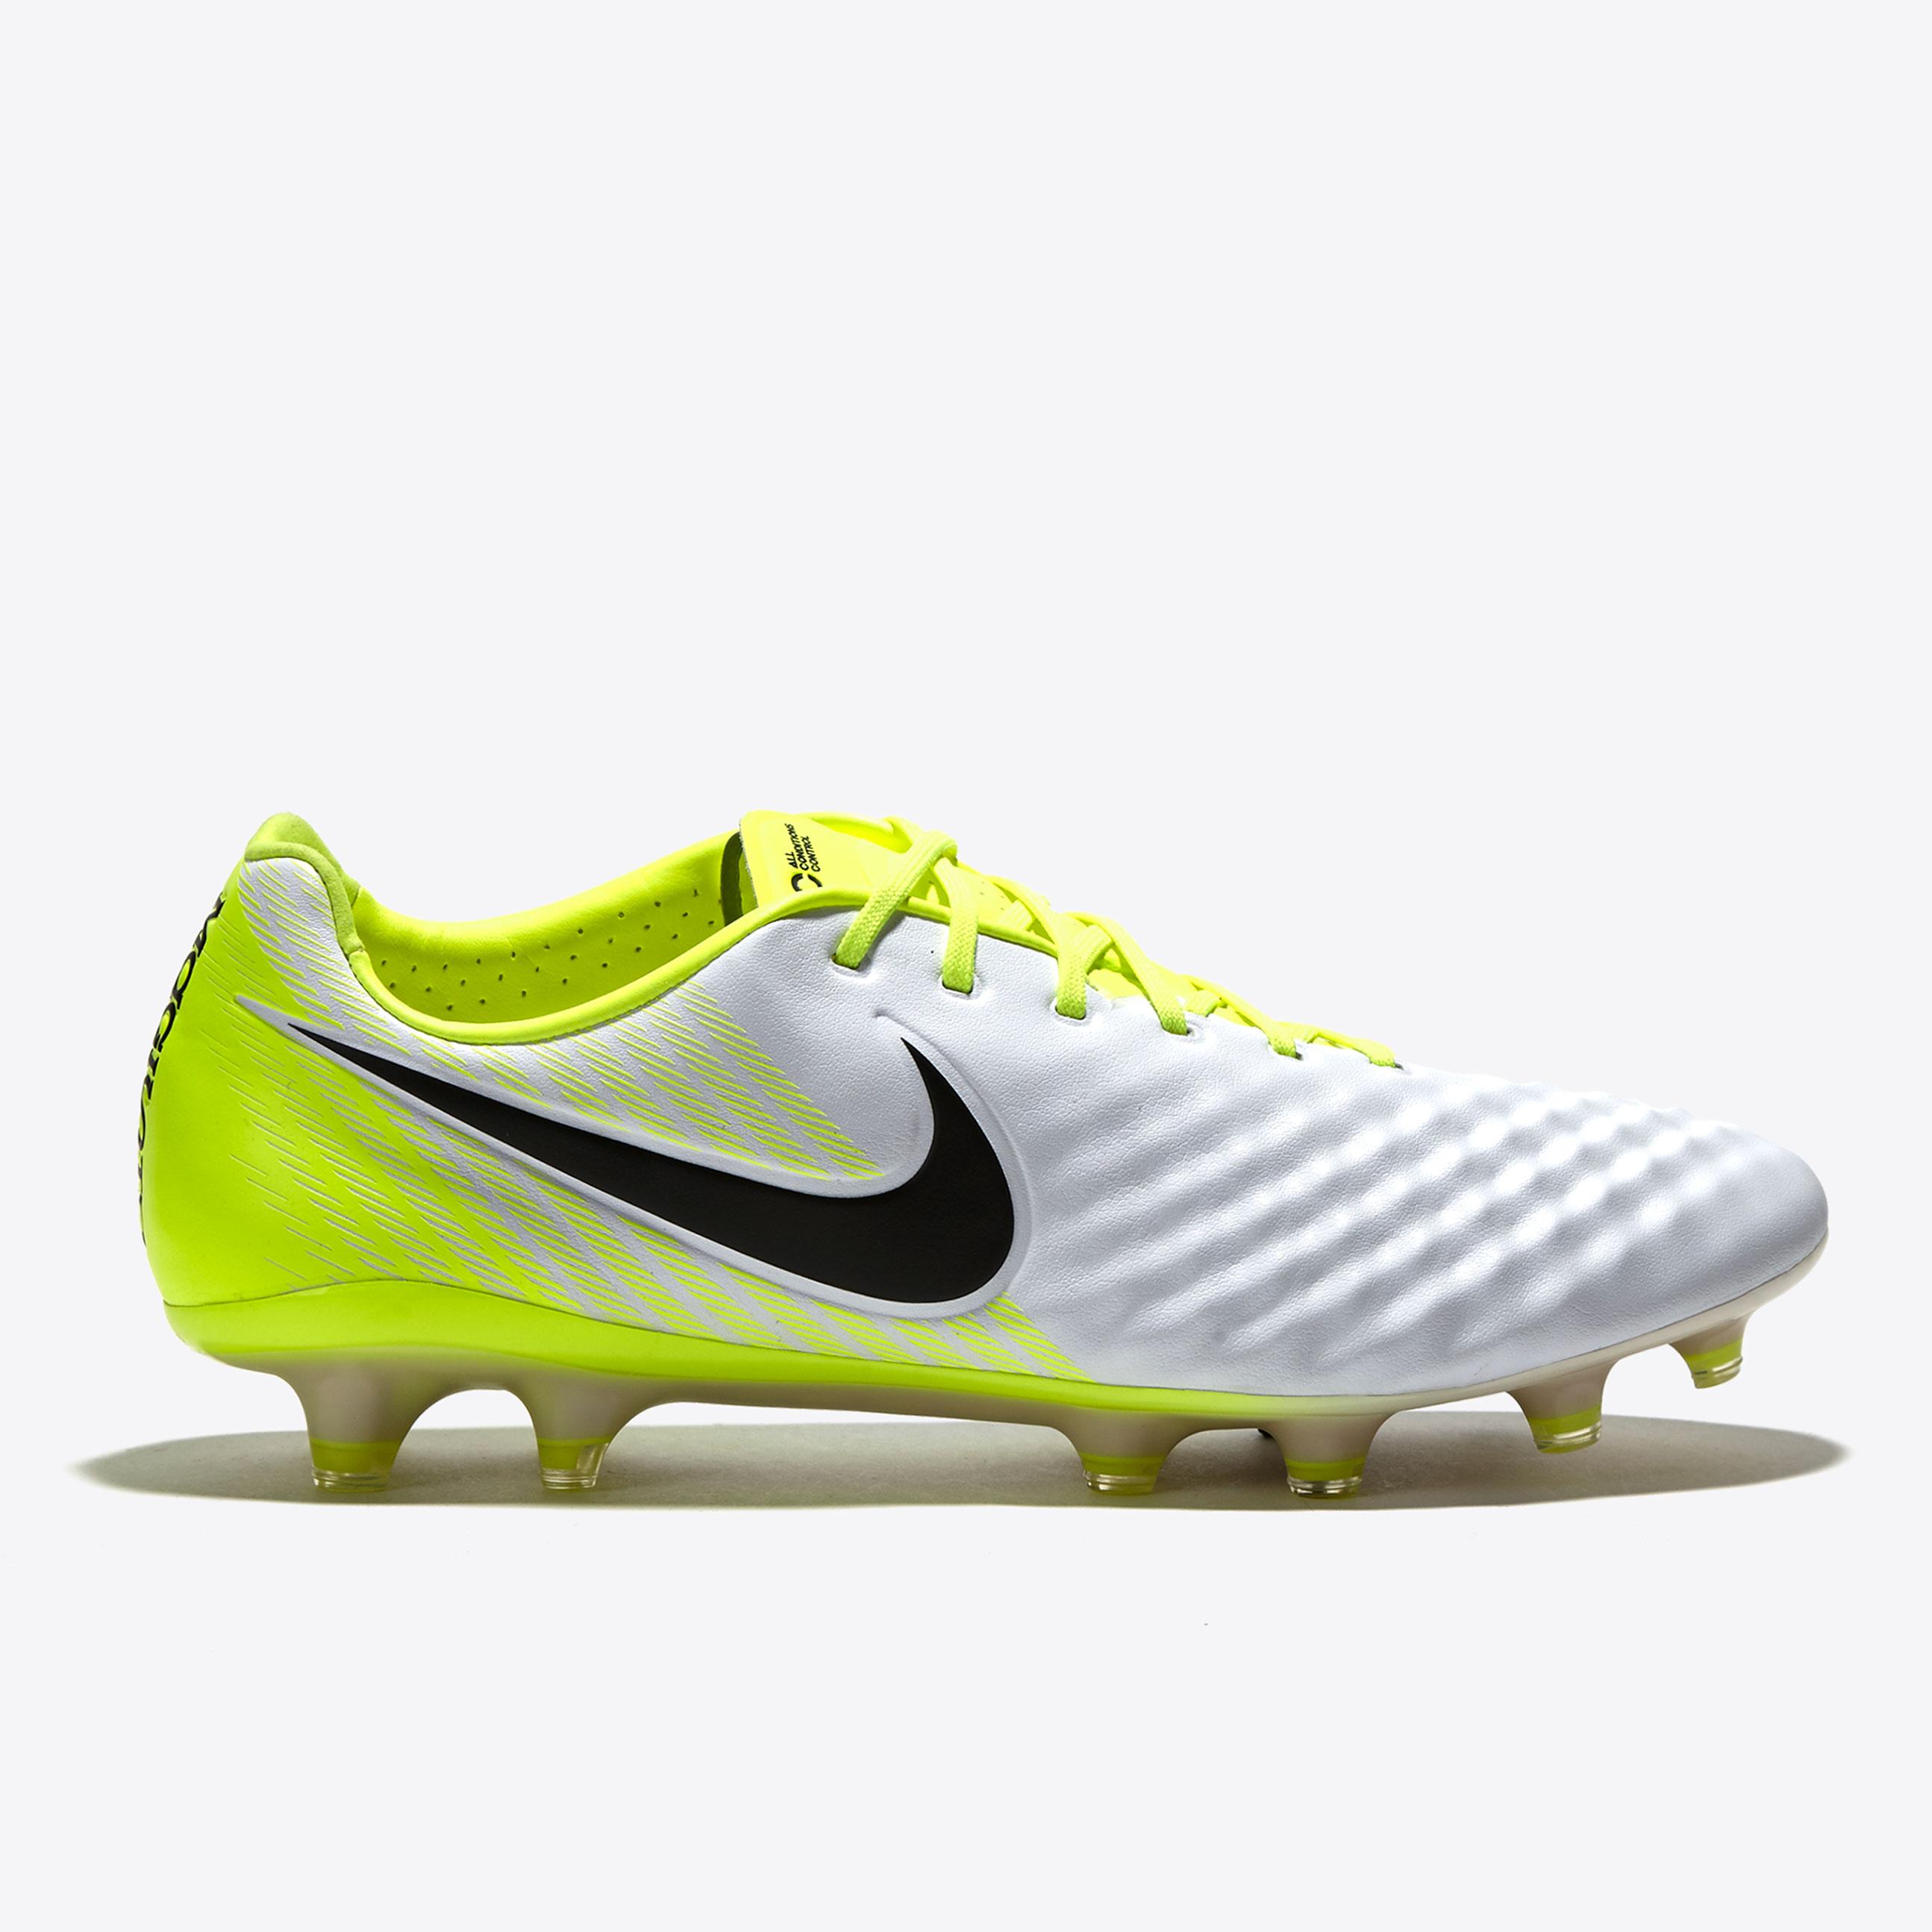 Nike Magista Opus II Firm Ground Football Boots - White/Black/Volt/Wol